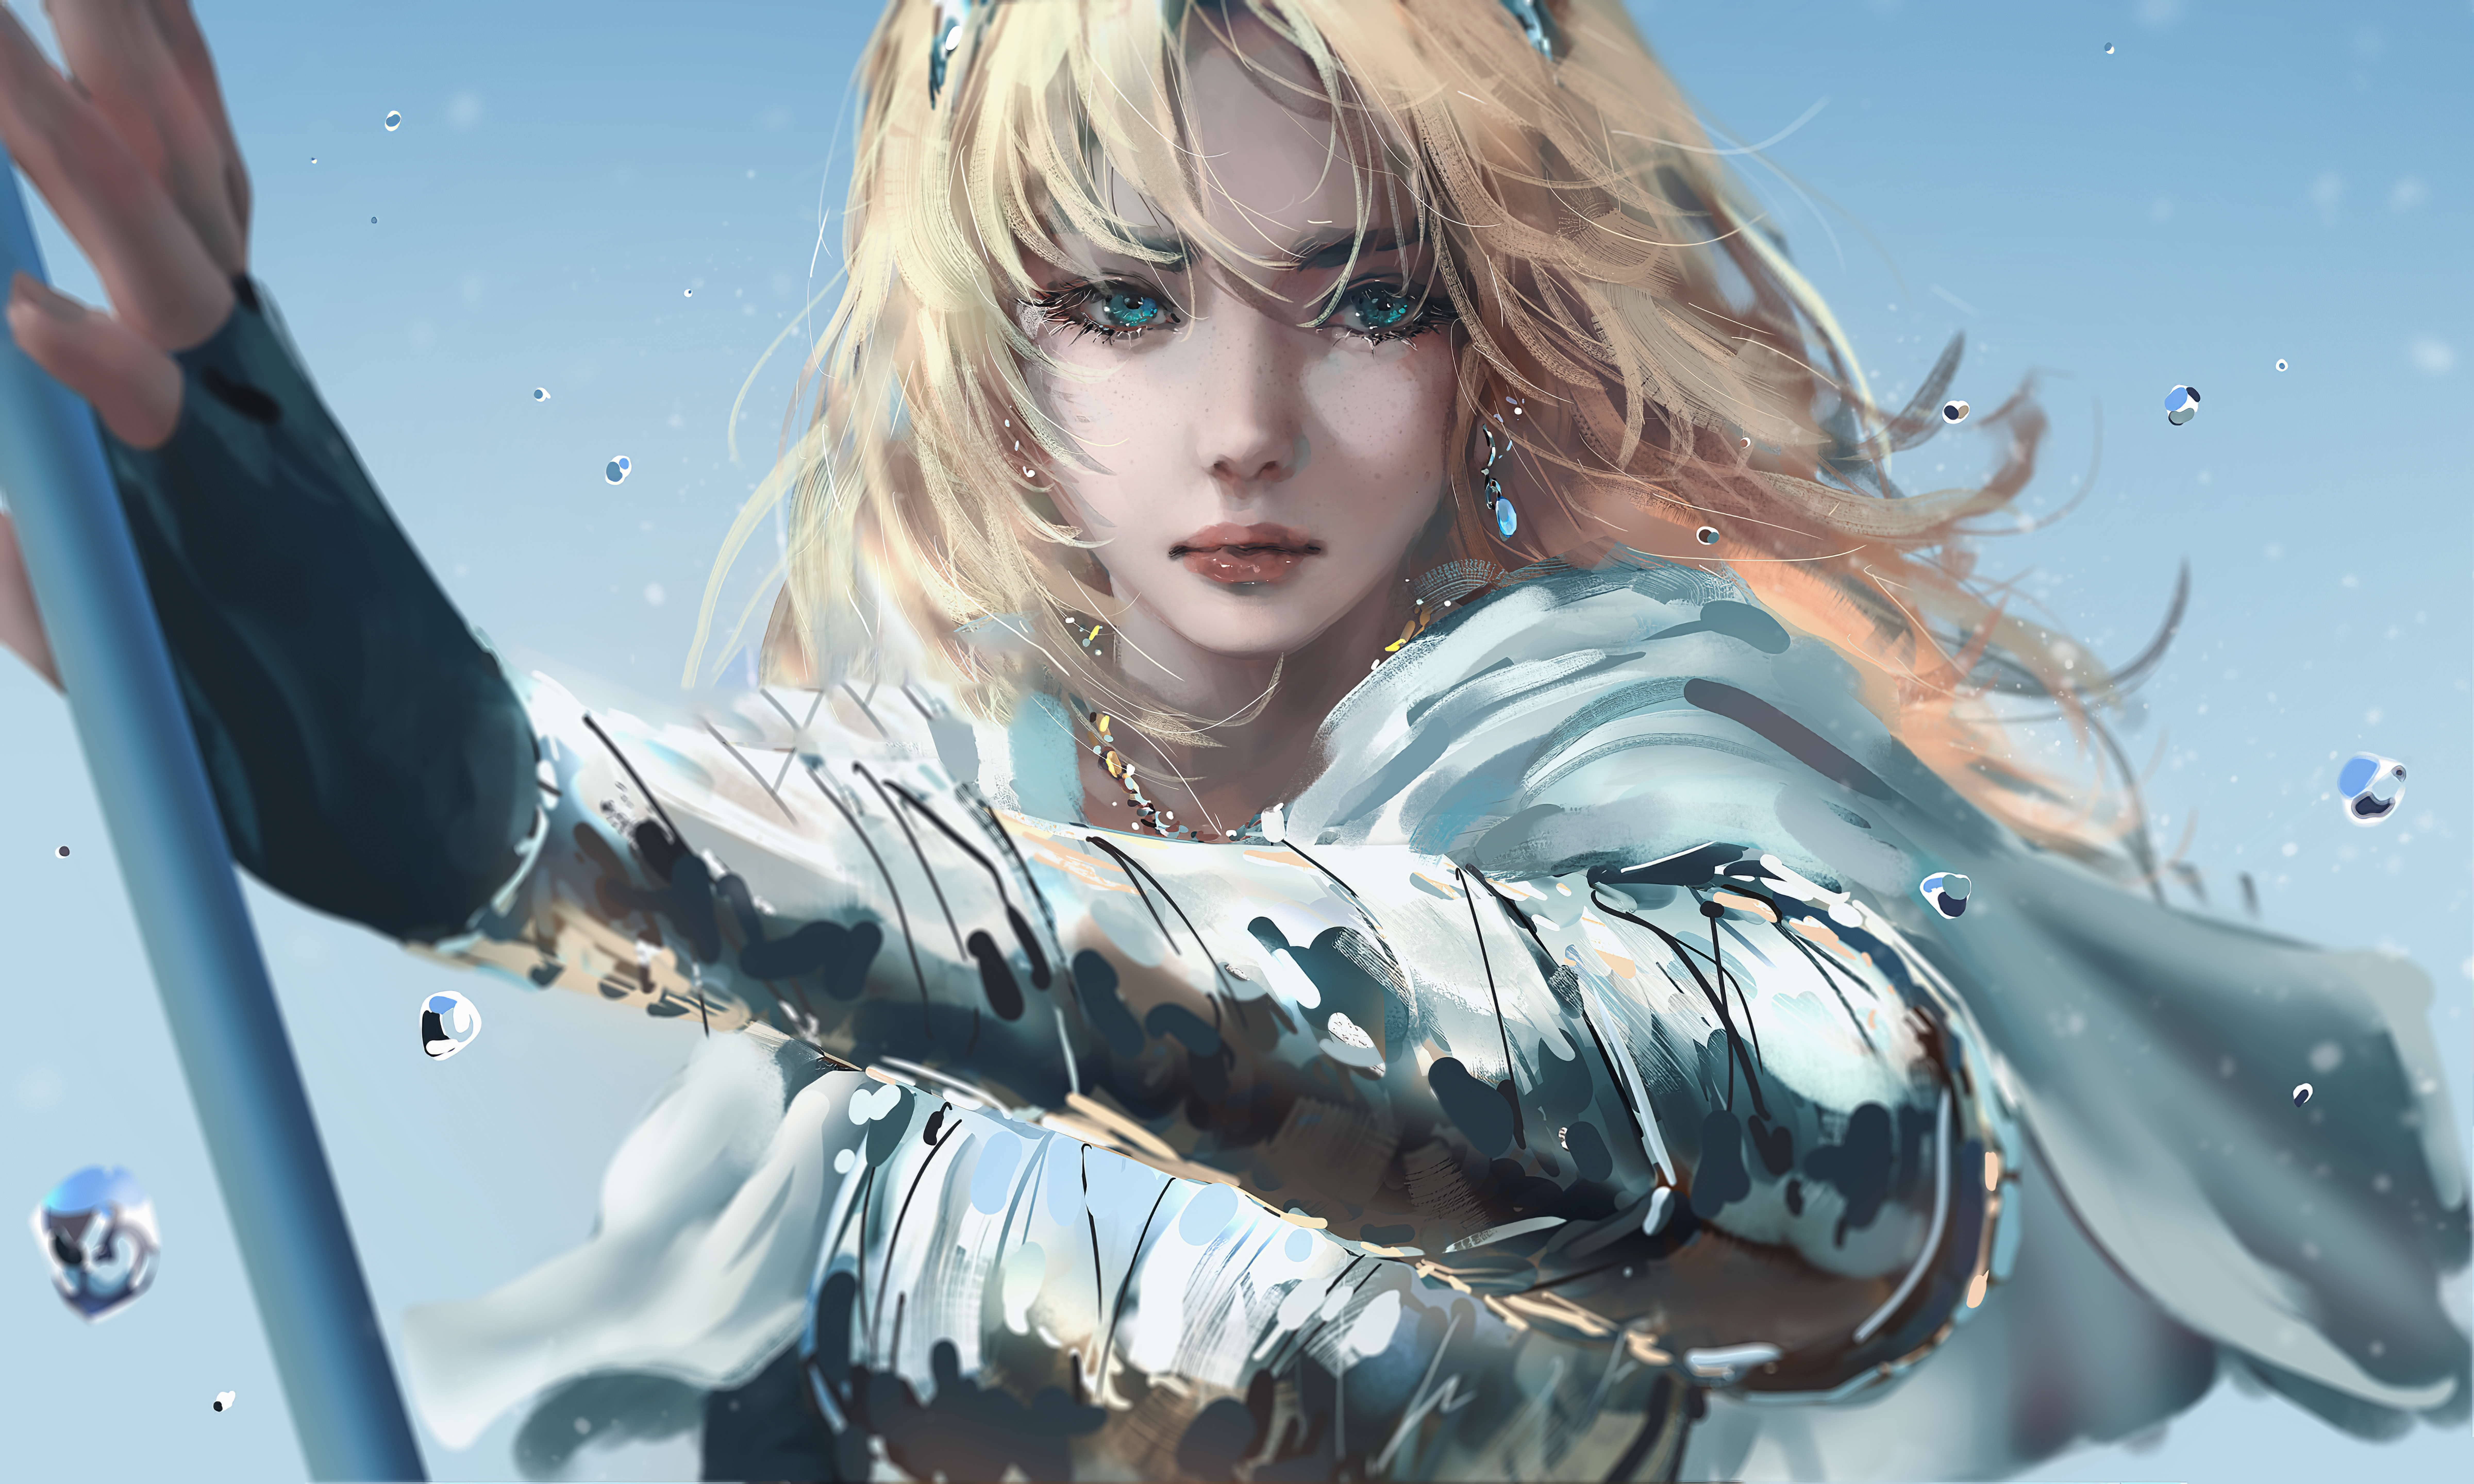 Girl Blonde Lux League Of Legends 9600x5760